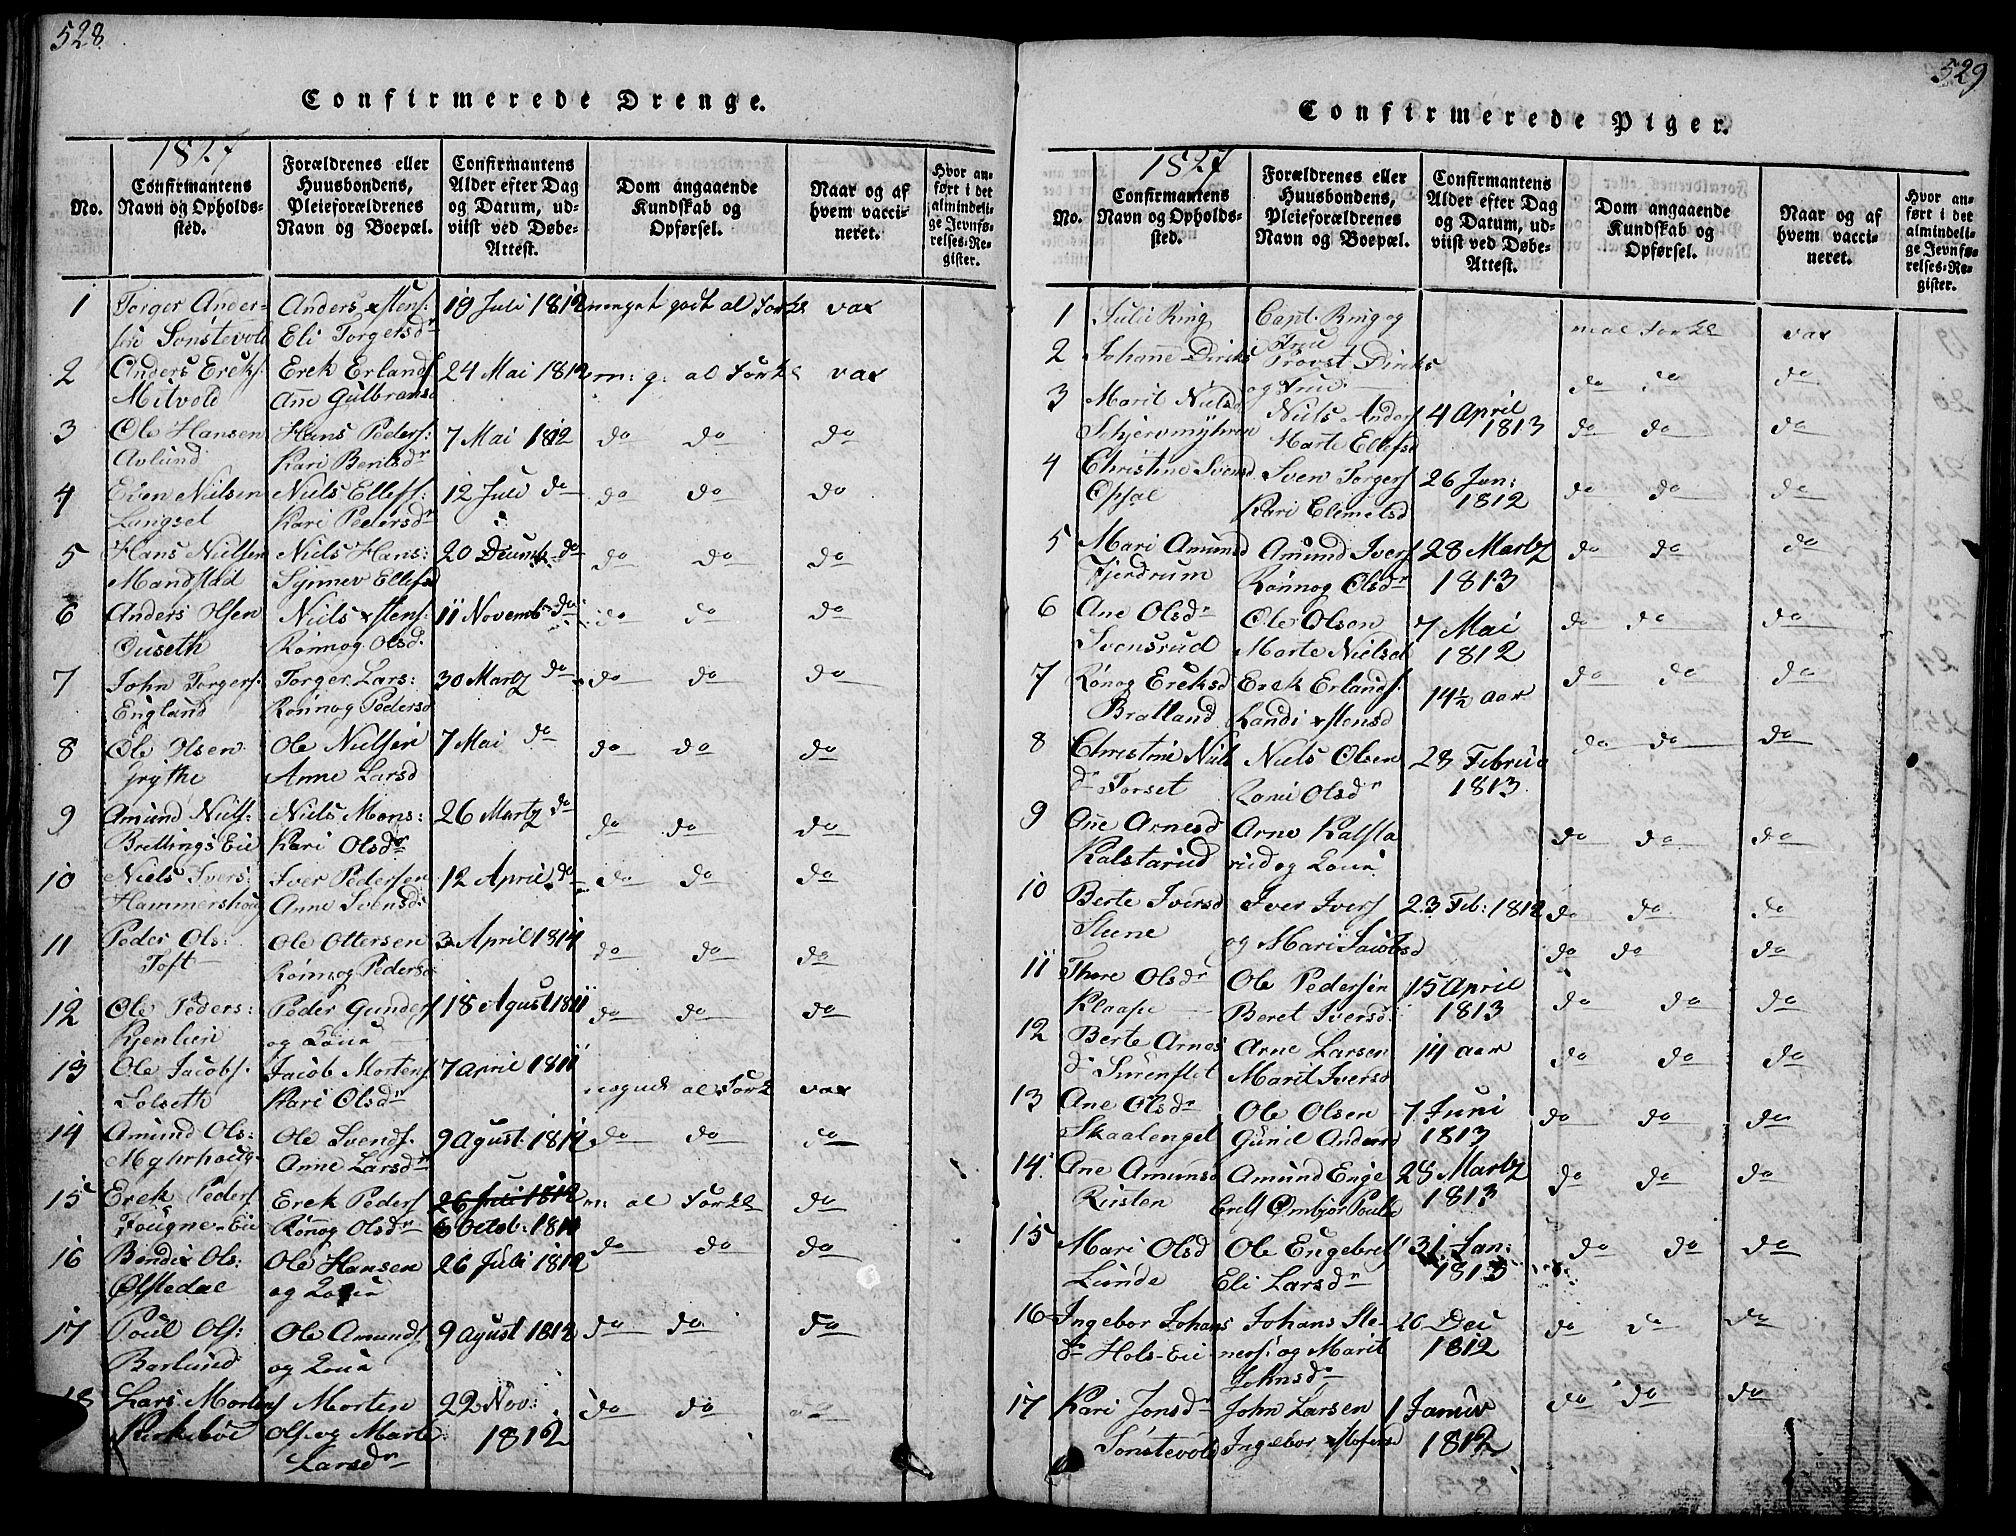 SAH, Gausdal prestekontor, Ministerialbok nr. 5, 1817-1829, s. 528-529